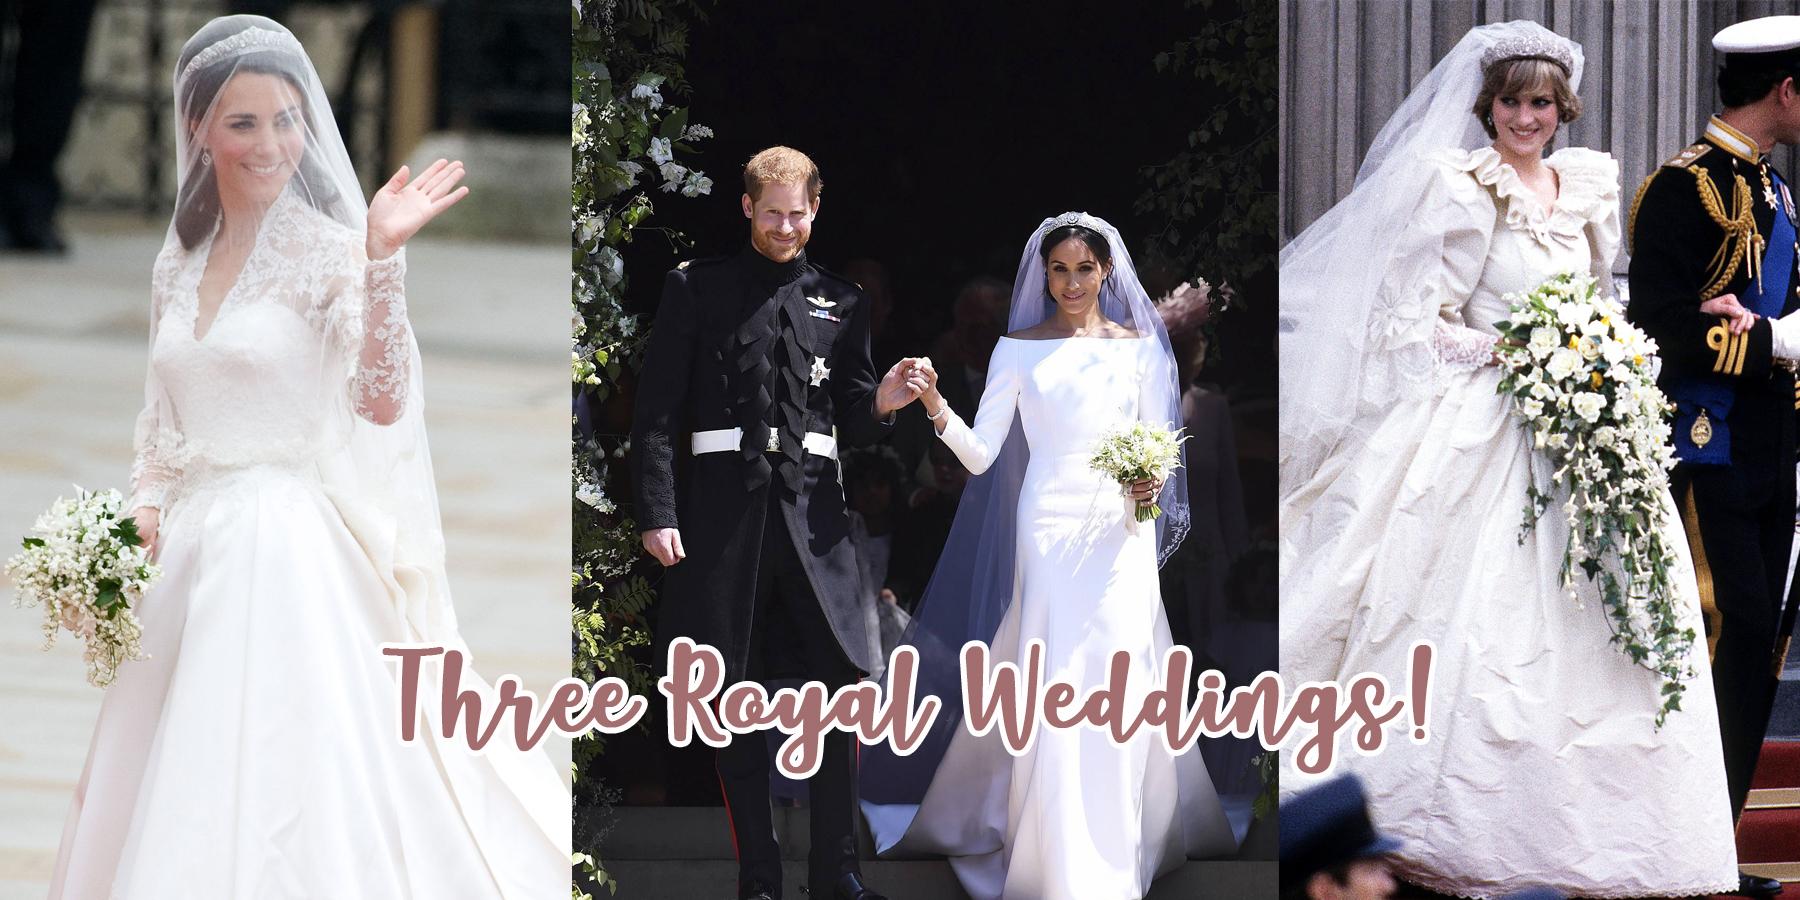 Three Royal Weddings: Years Apart Yet They Look So Similar